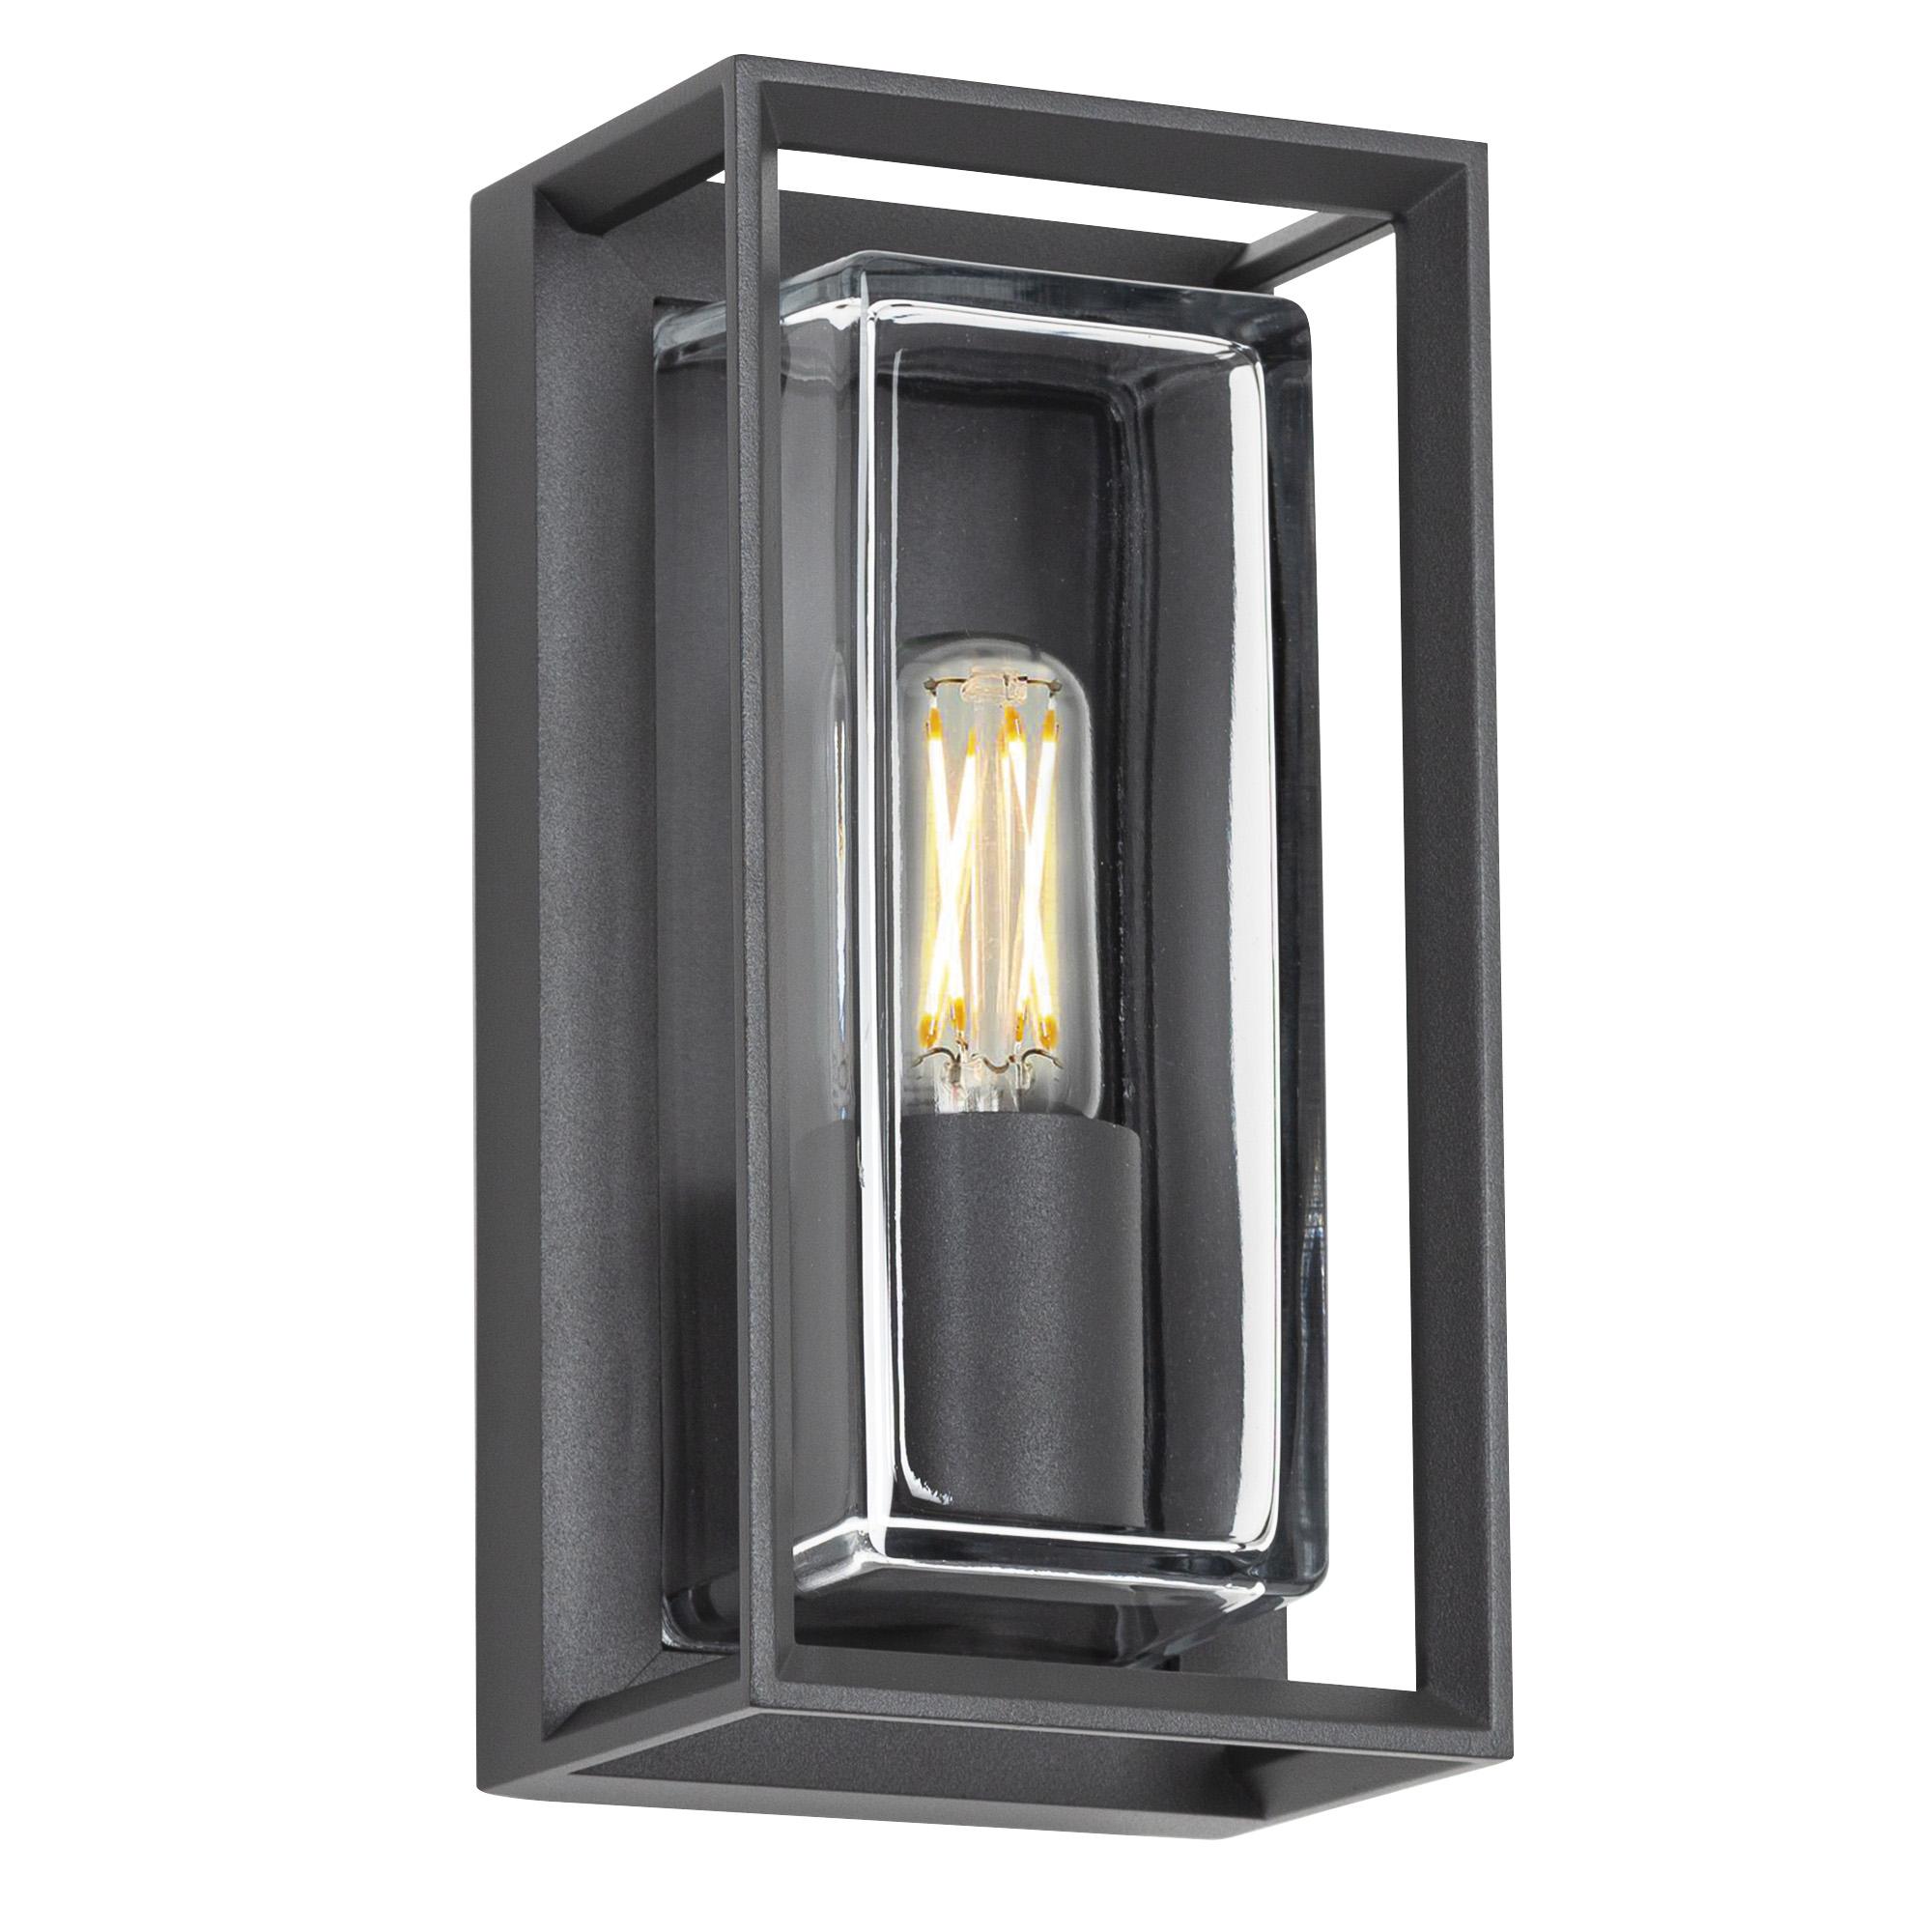 Wandlamp Eaton antraciet